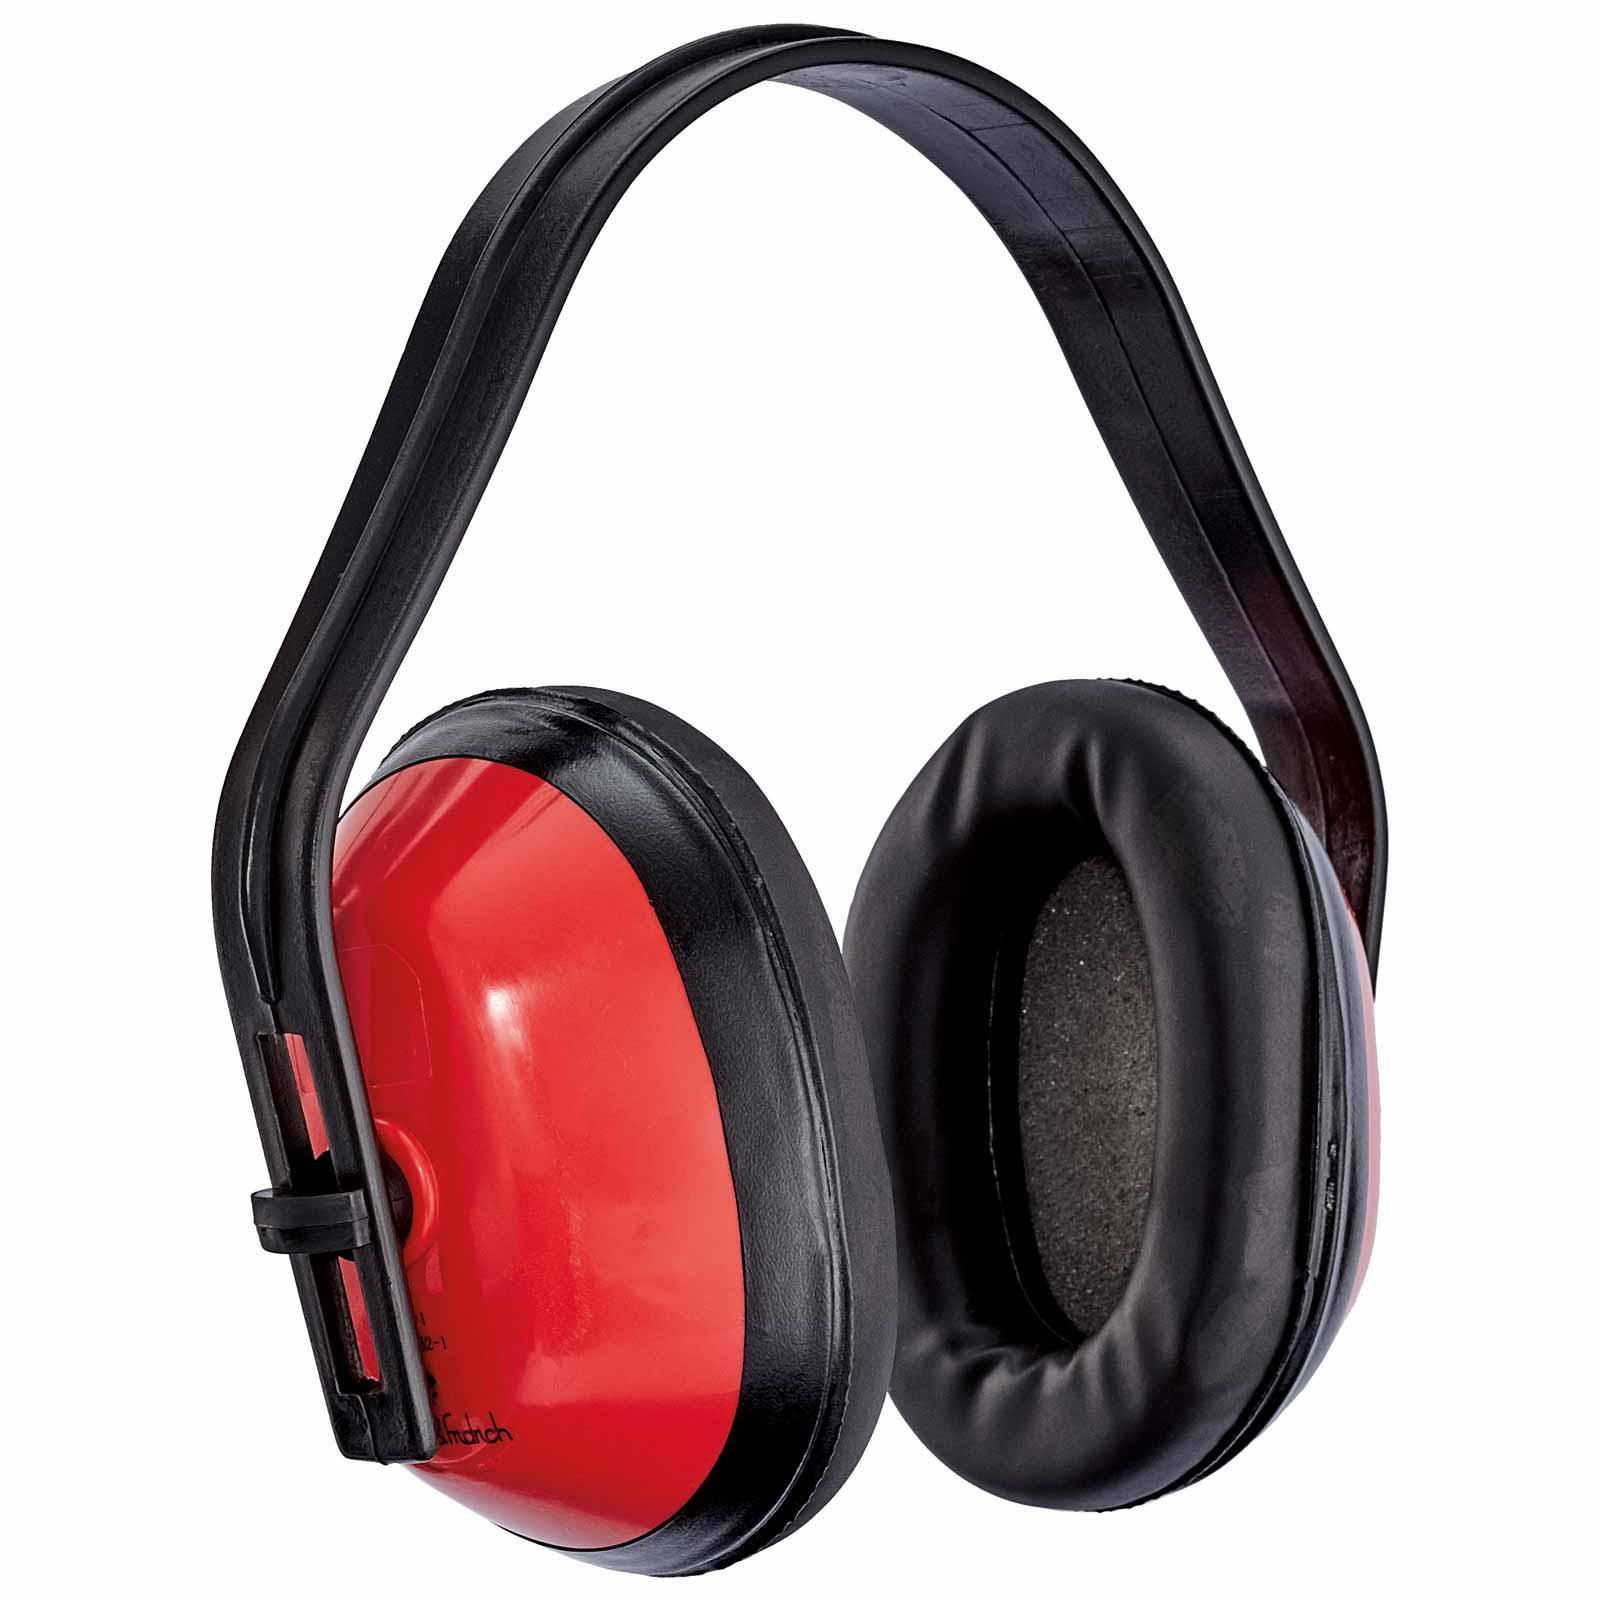 Kapselgehörschutz PROTEKT BASIC, Gehörschutz, Gehörschutzkapsel 25dB, Helm Gehörschutz, Lernhilfe für Schulunterricht, Kindergehörschutz